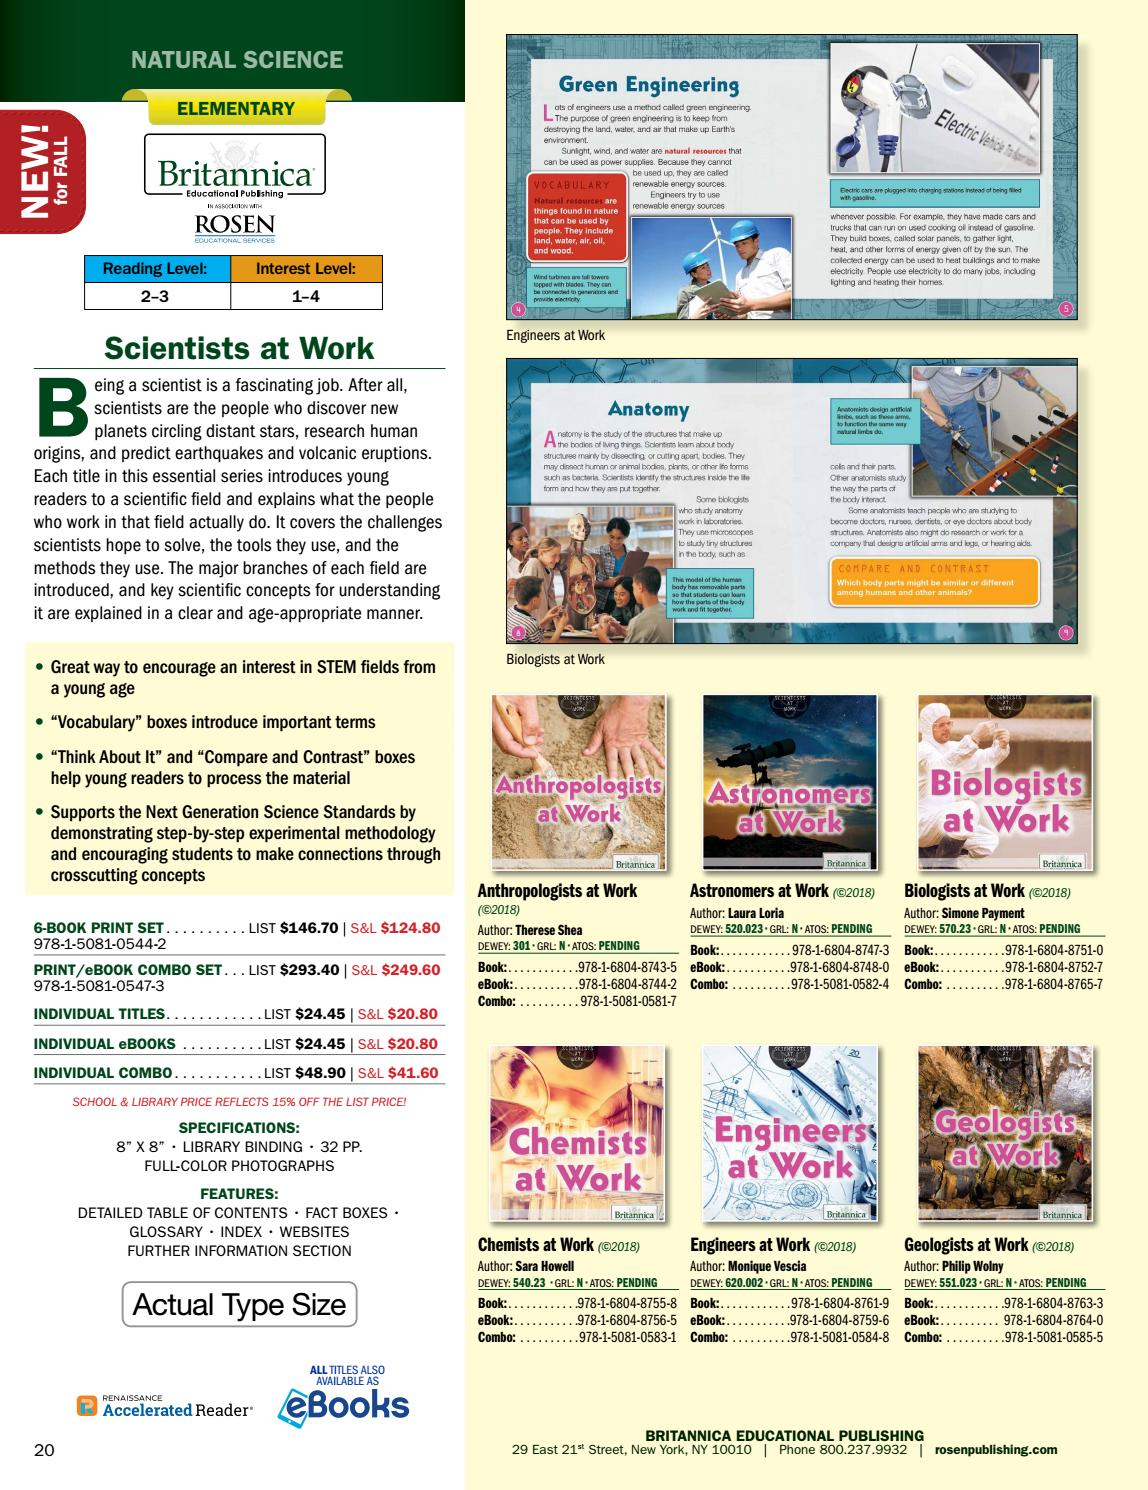 Mje15030 Ebook Download